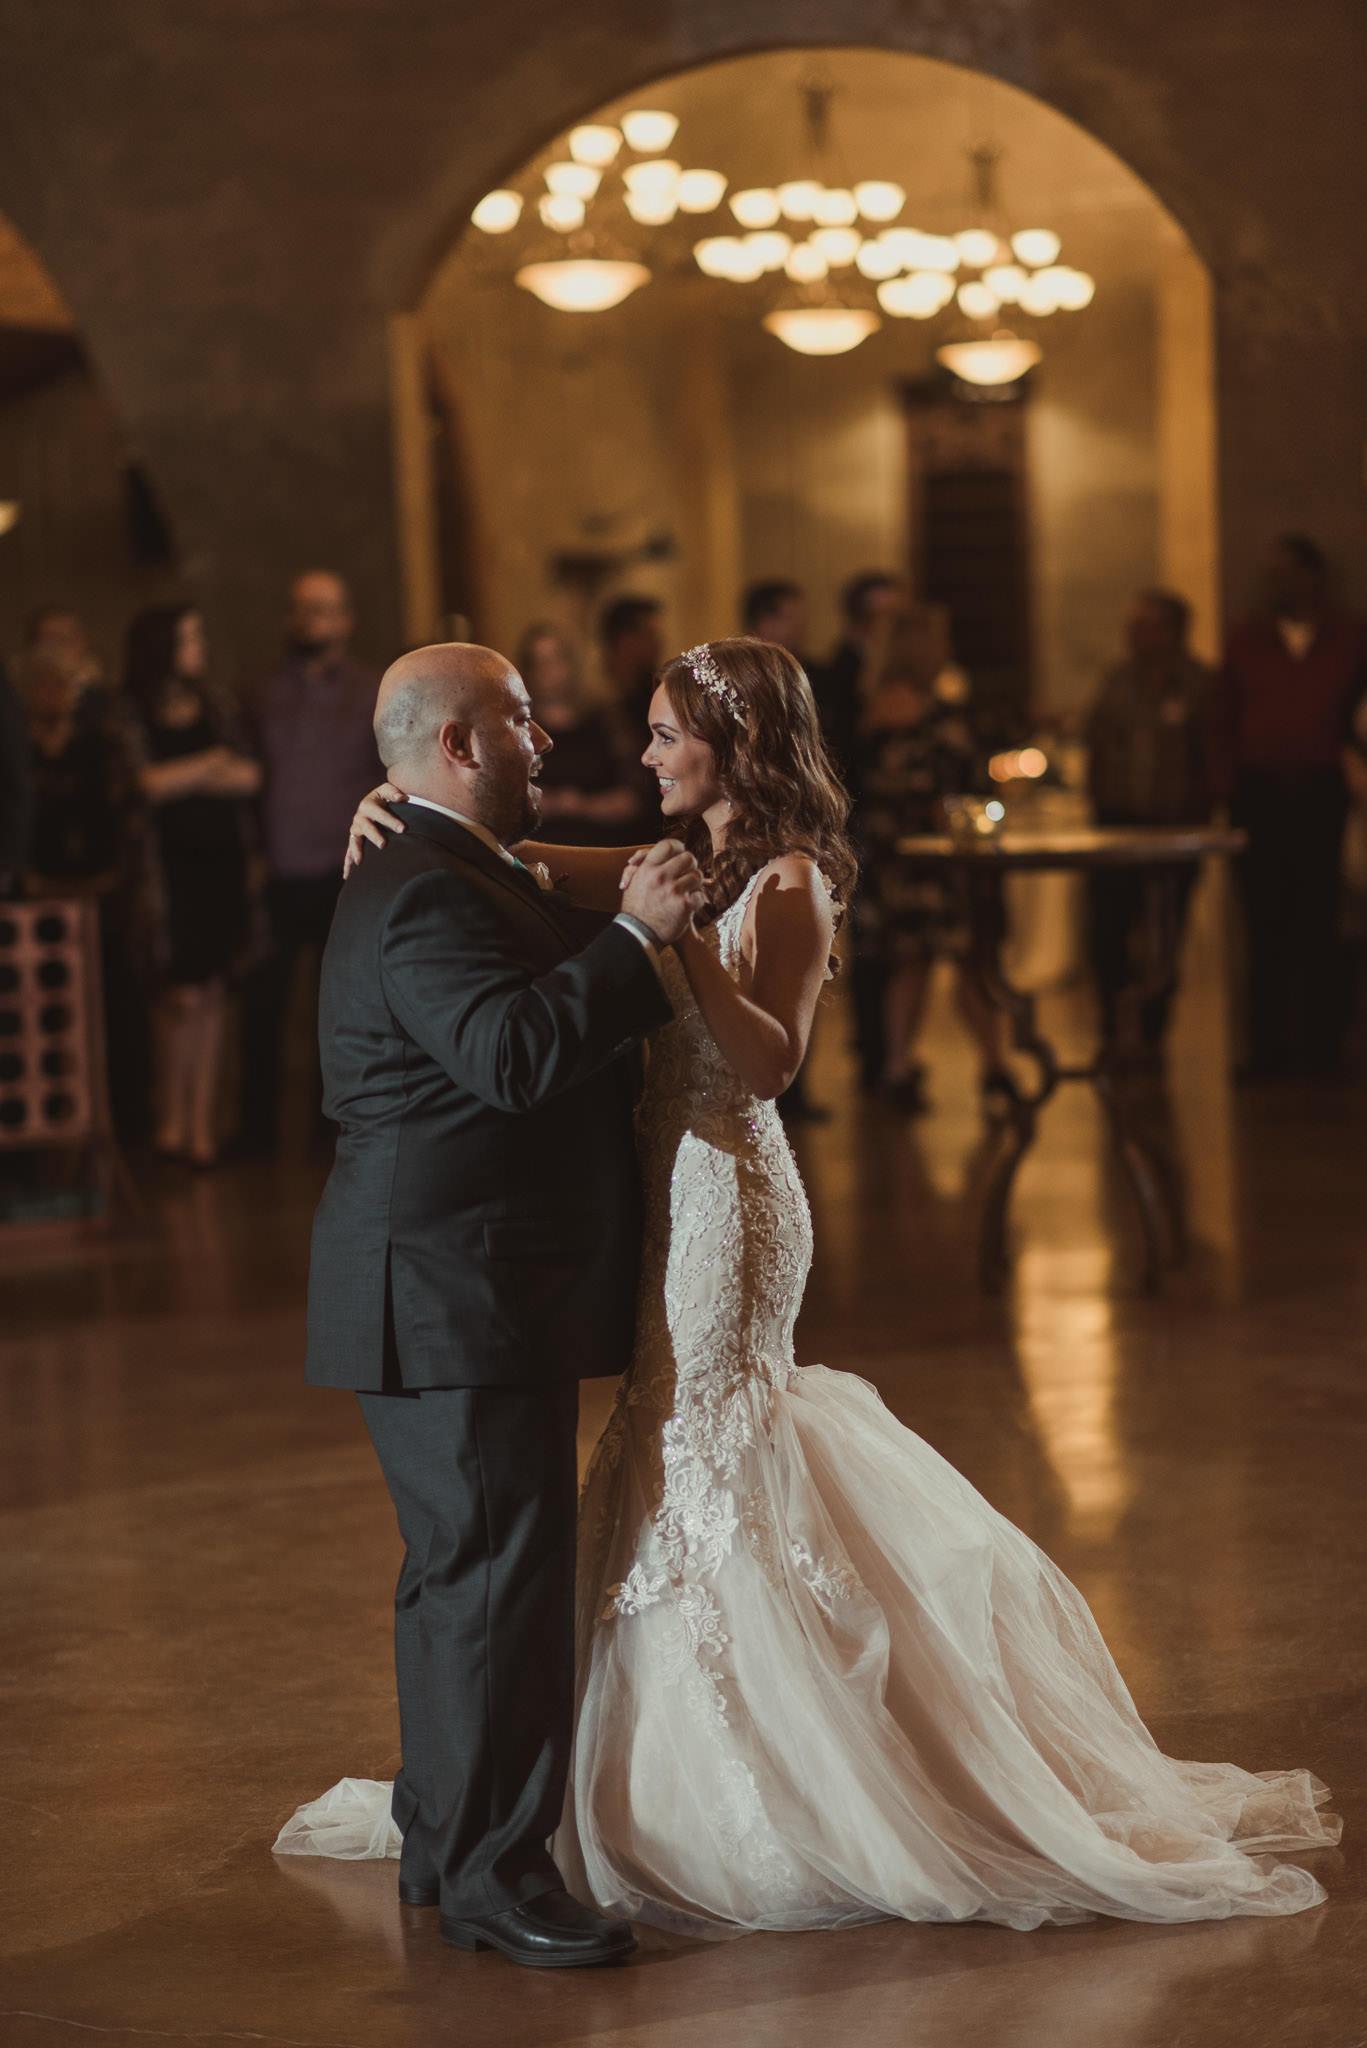 Cynthia-Curtis-Olde-Dobbine-Station-Houston-Wedding-Photographer-sm-88.jpg